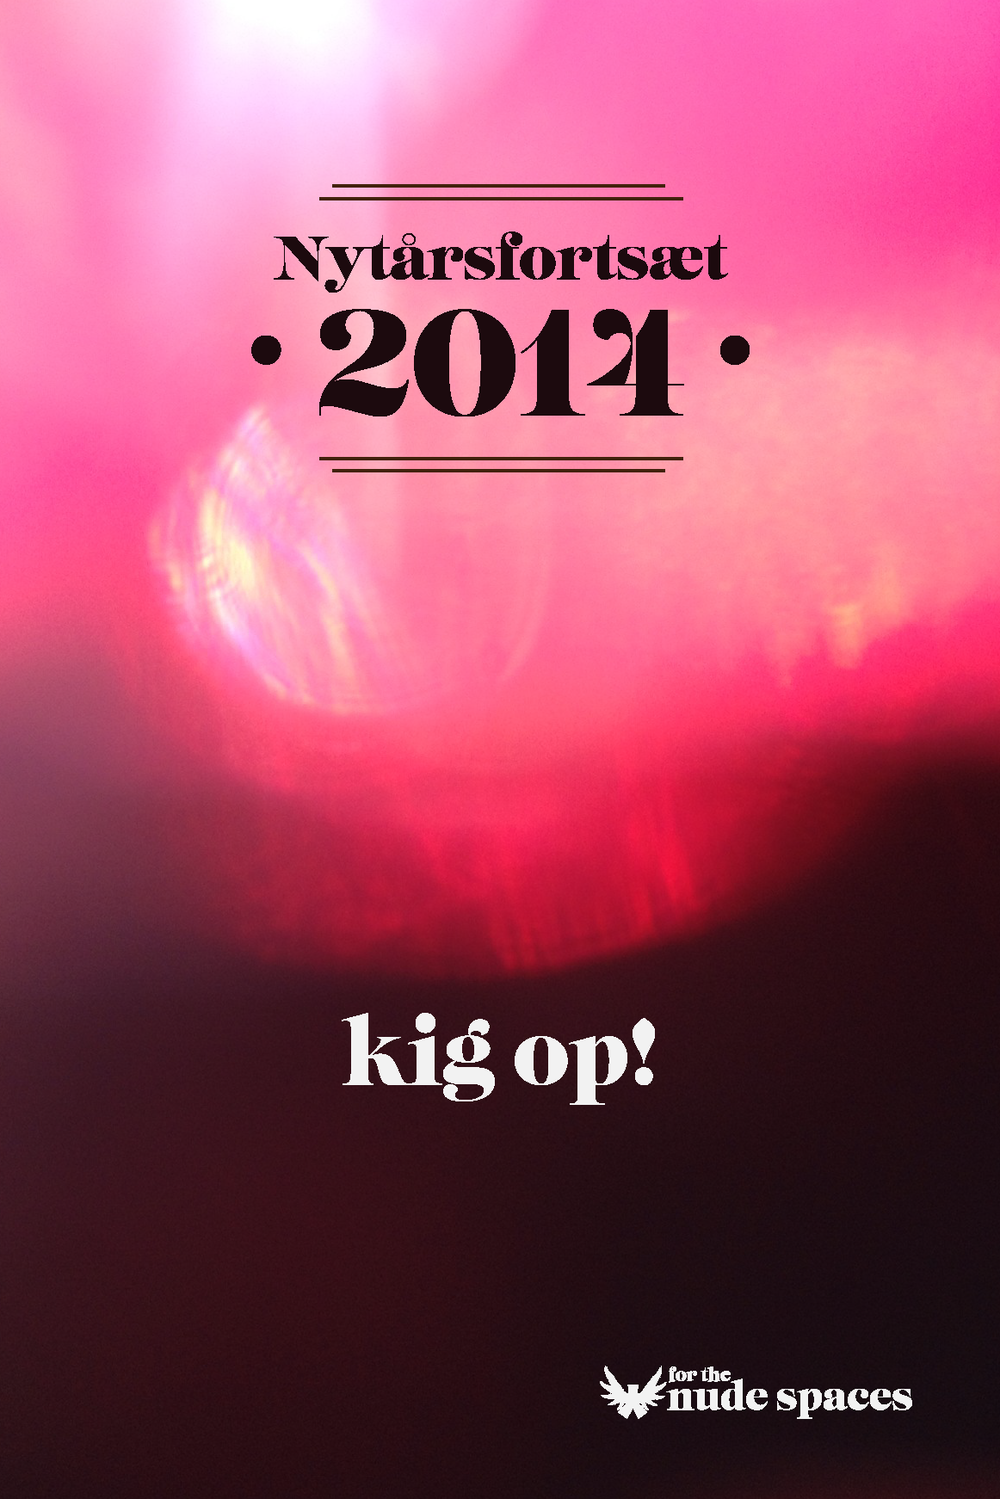 nytaarsfortsaet2014.png